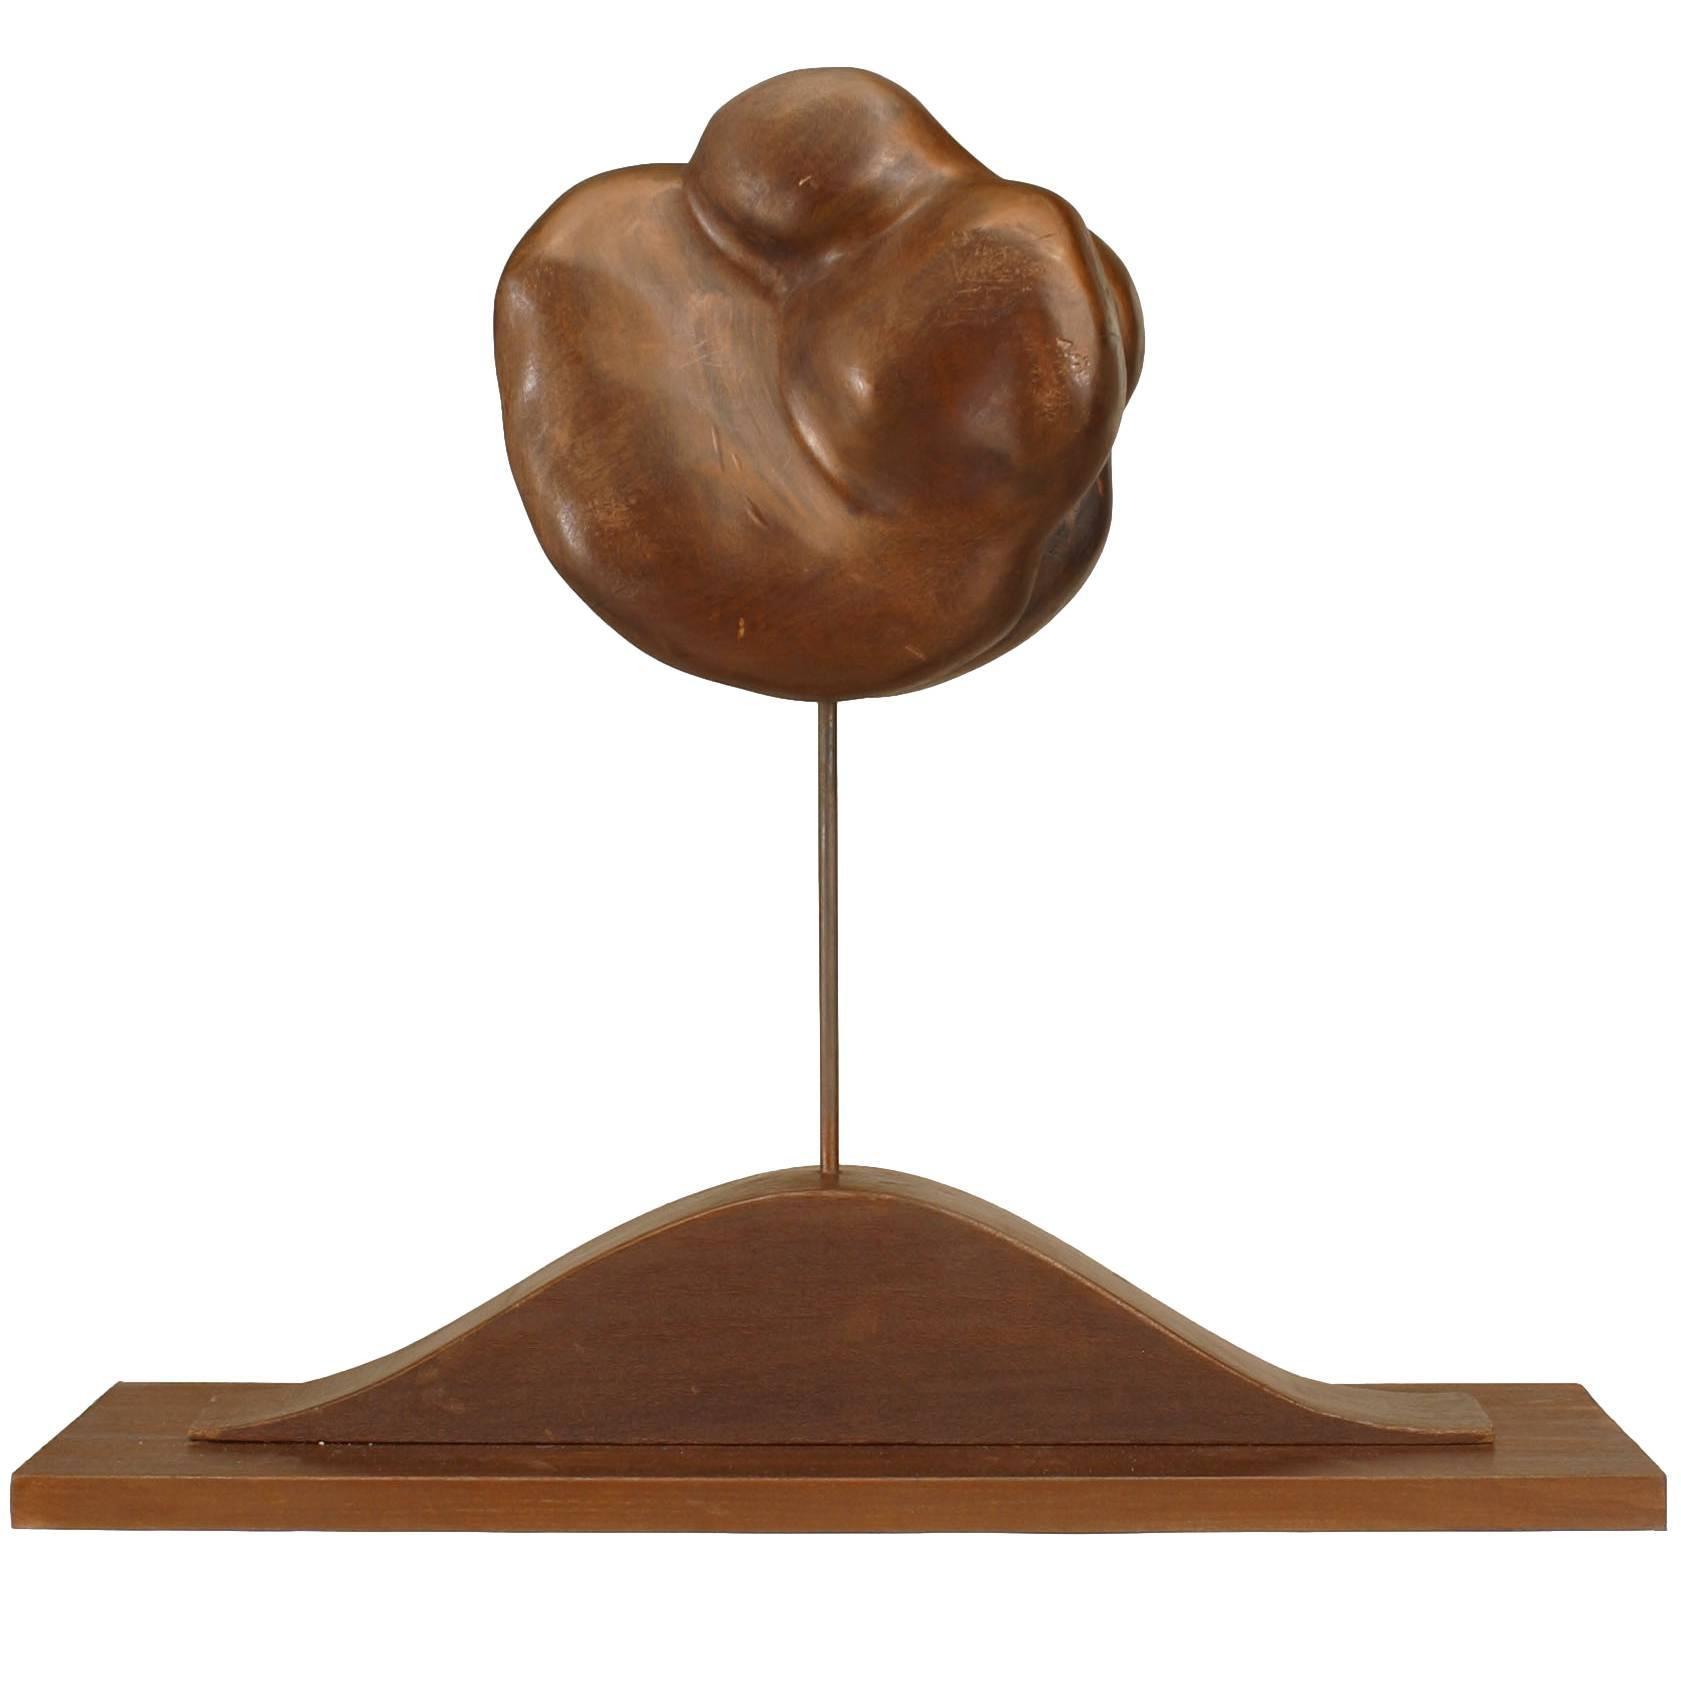 20th Century American Freeform Wooden Sculpture